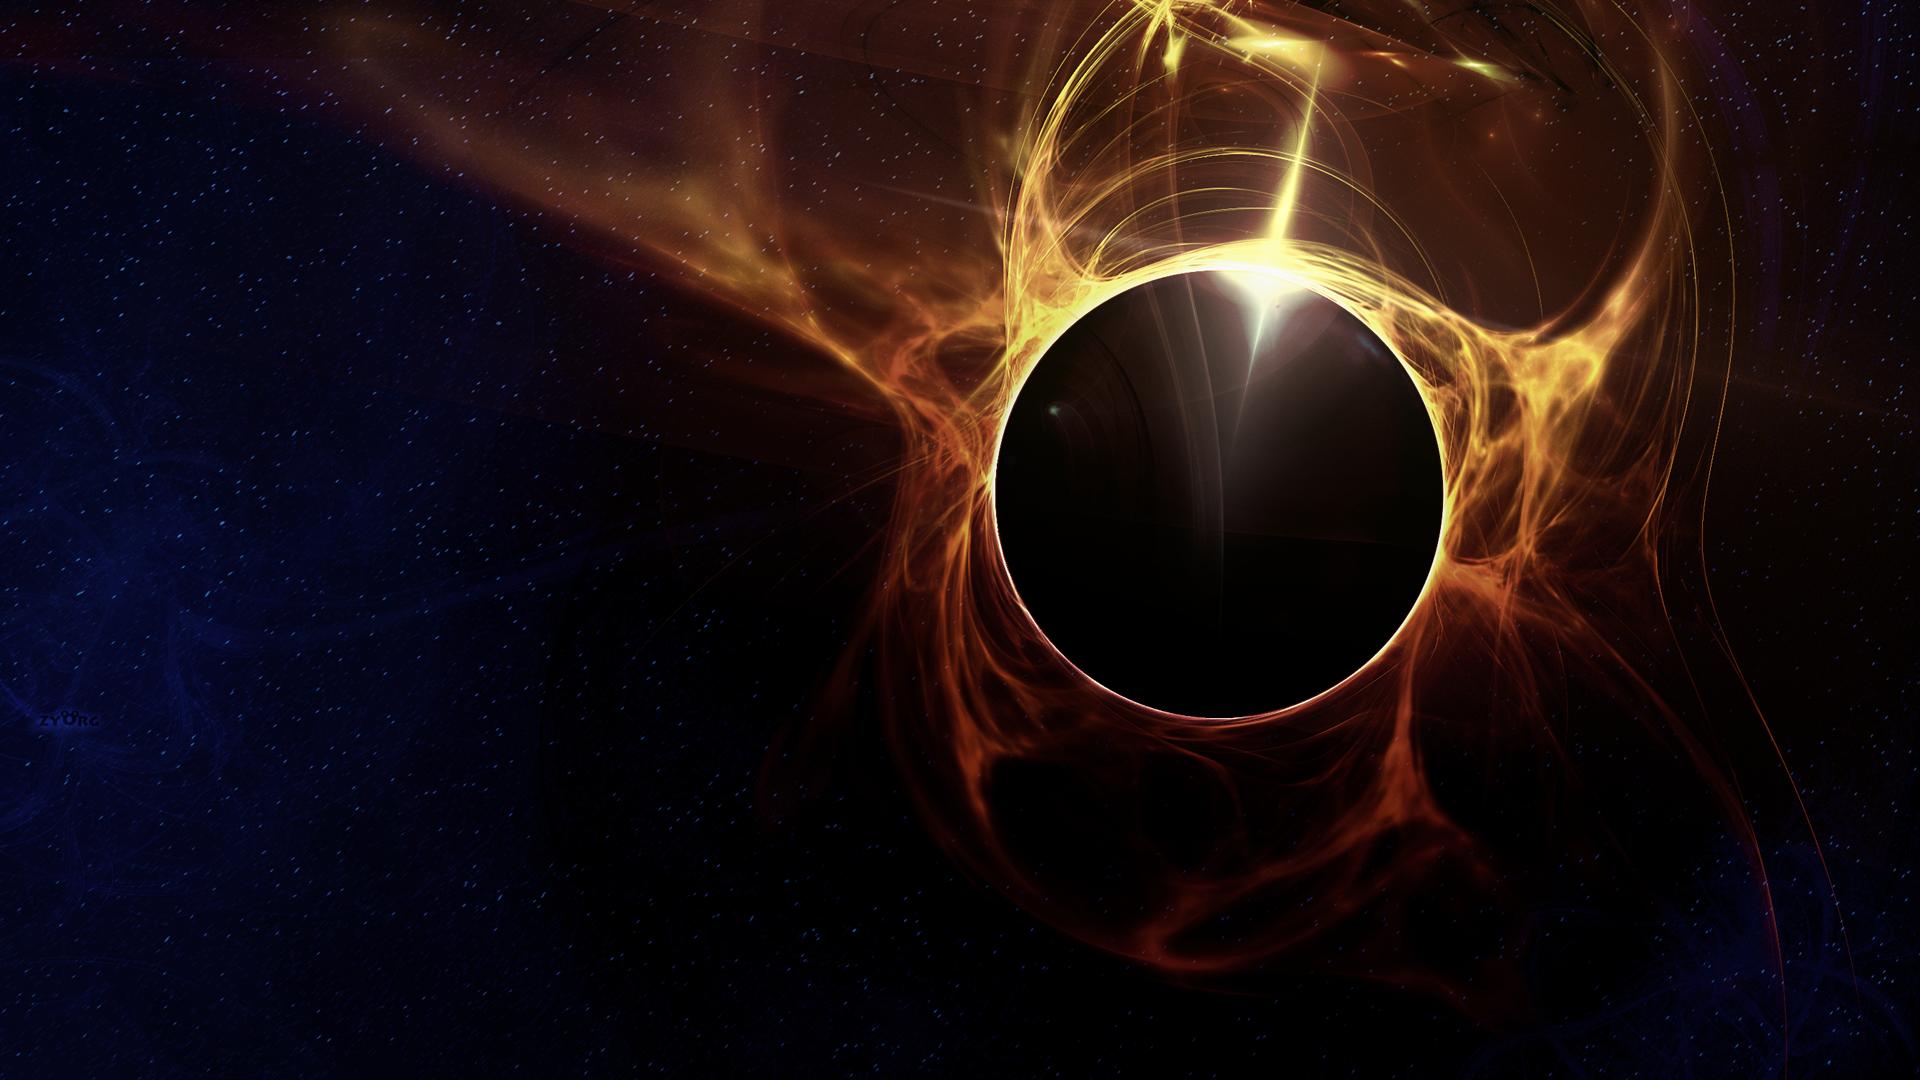 eclipse by zy0rg on deviantart